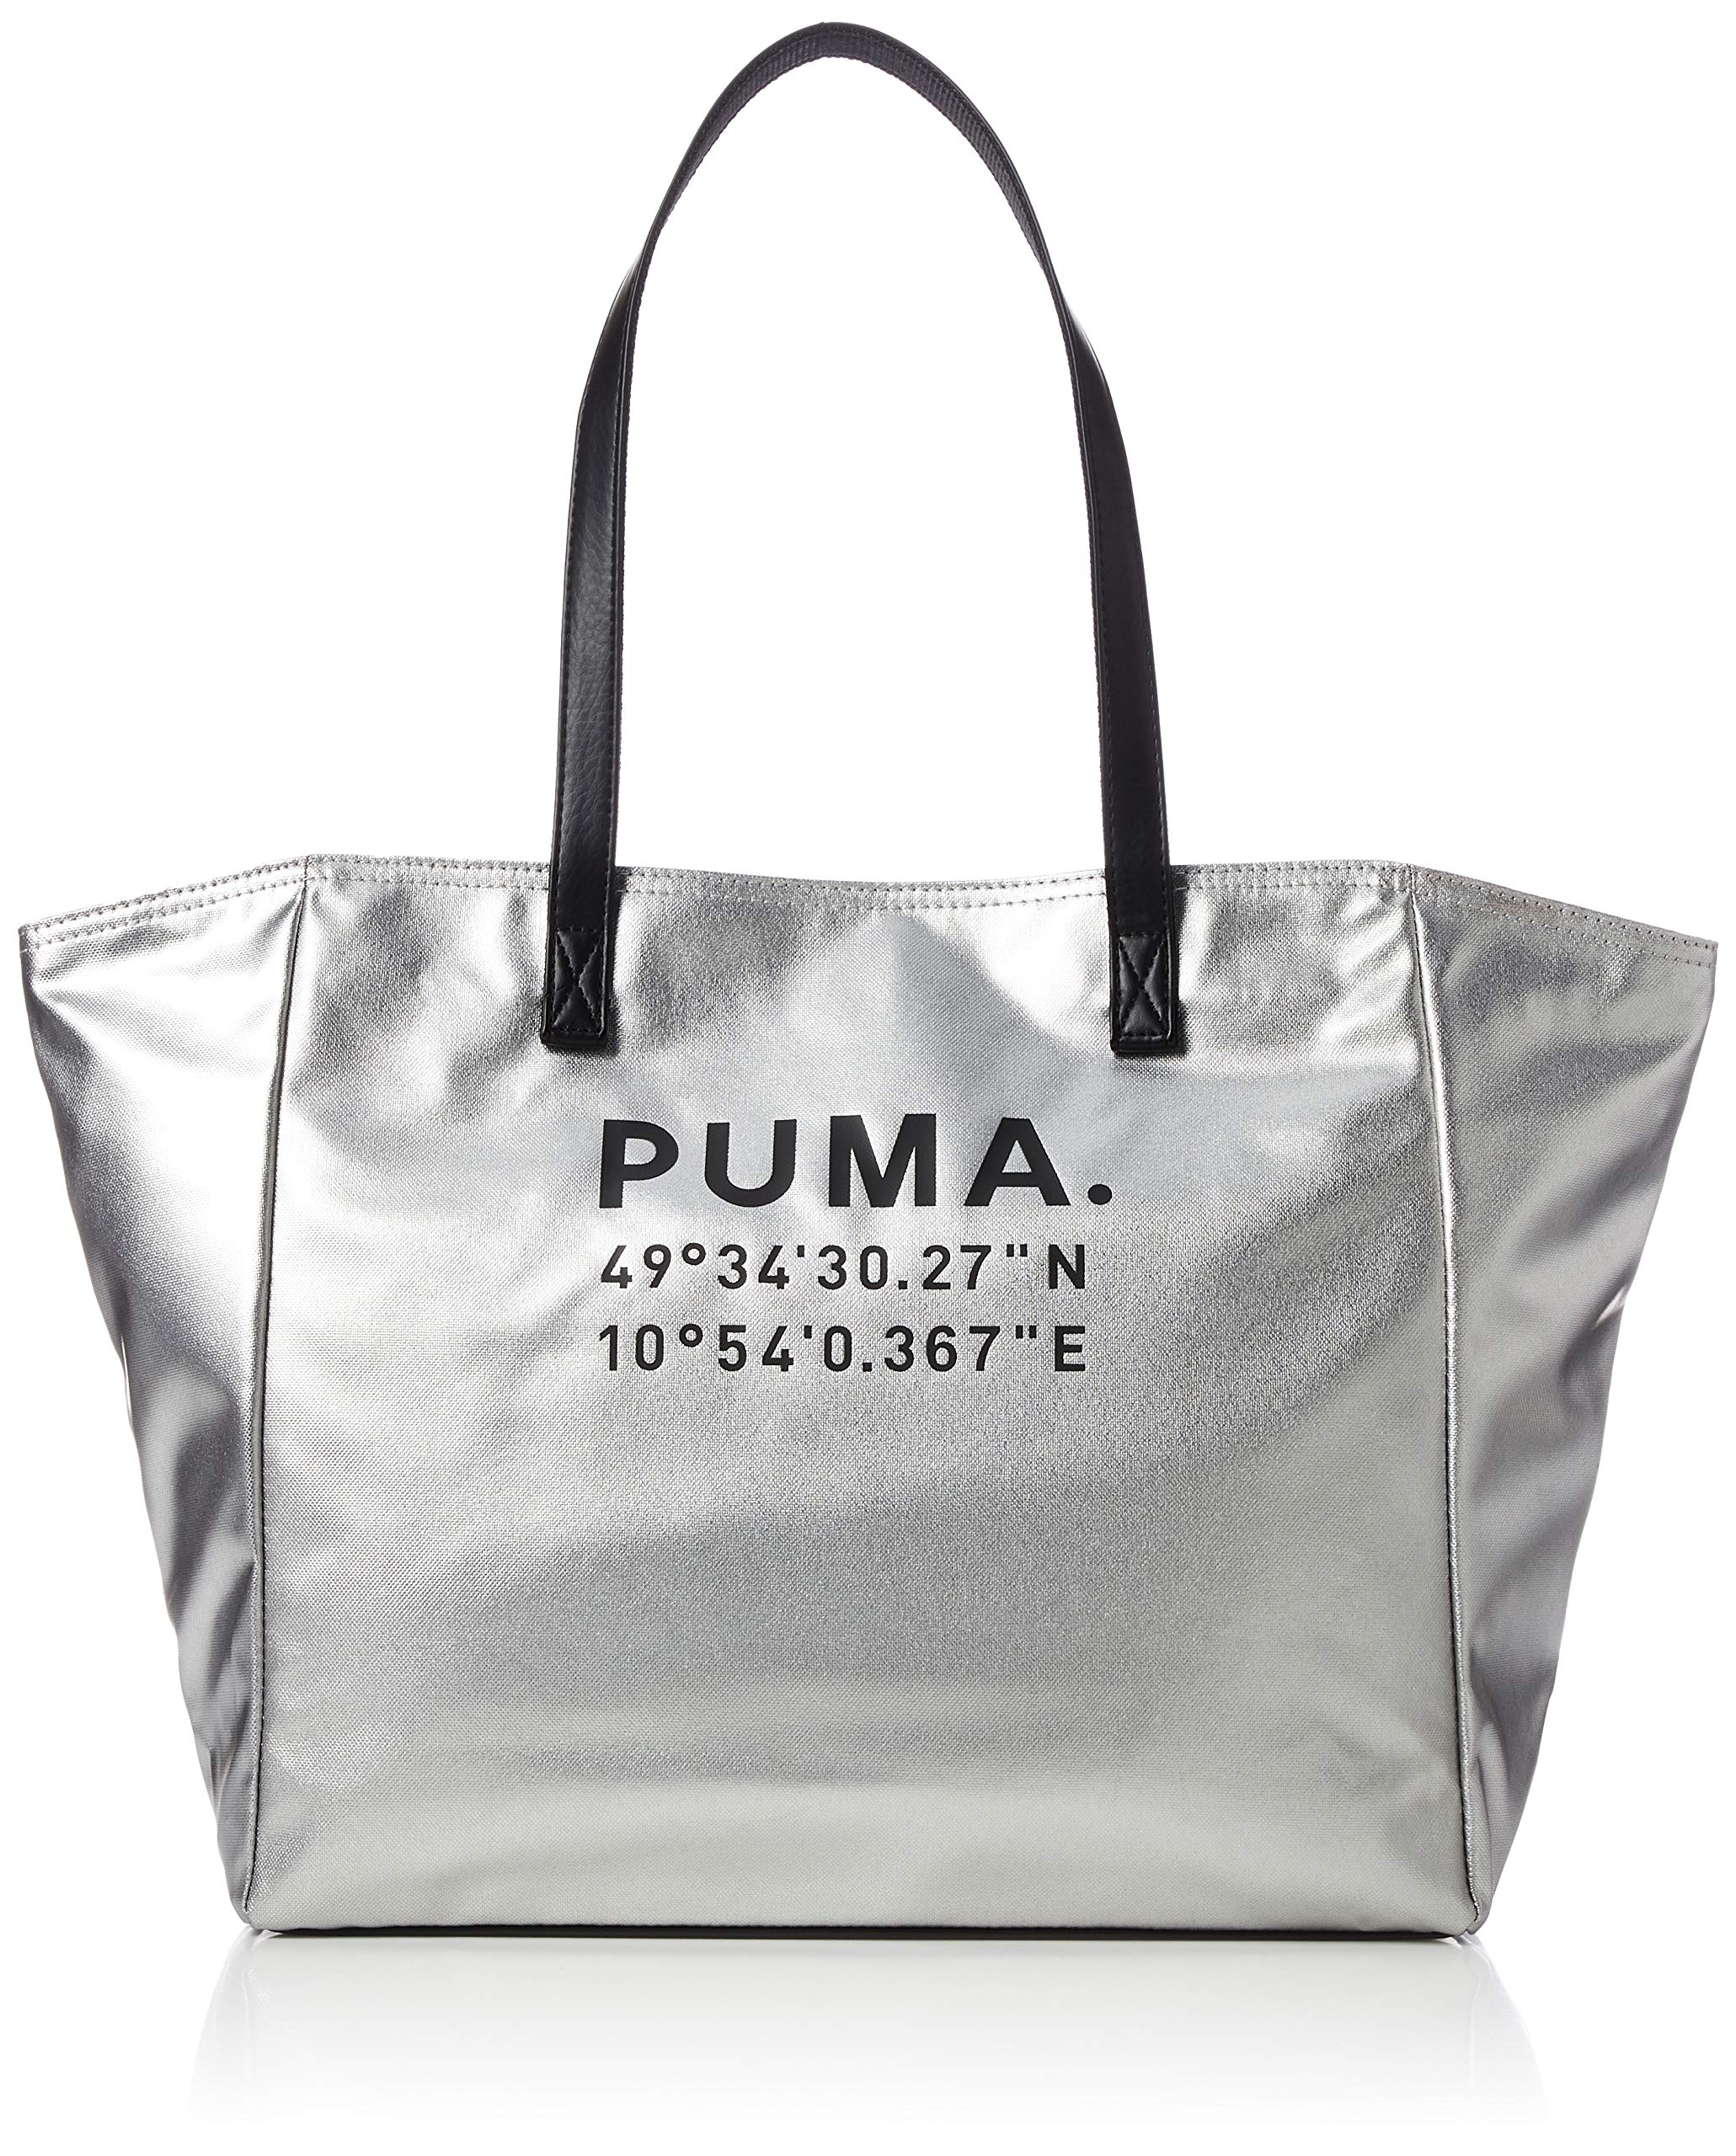 PUMA Prime Time Large Shopper X-mas Bandolera, Mujer